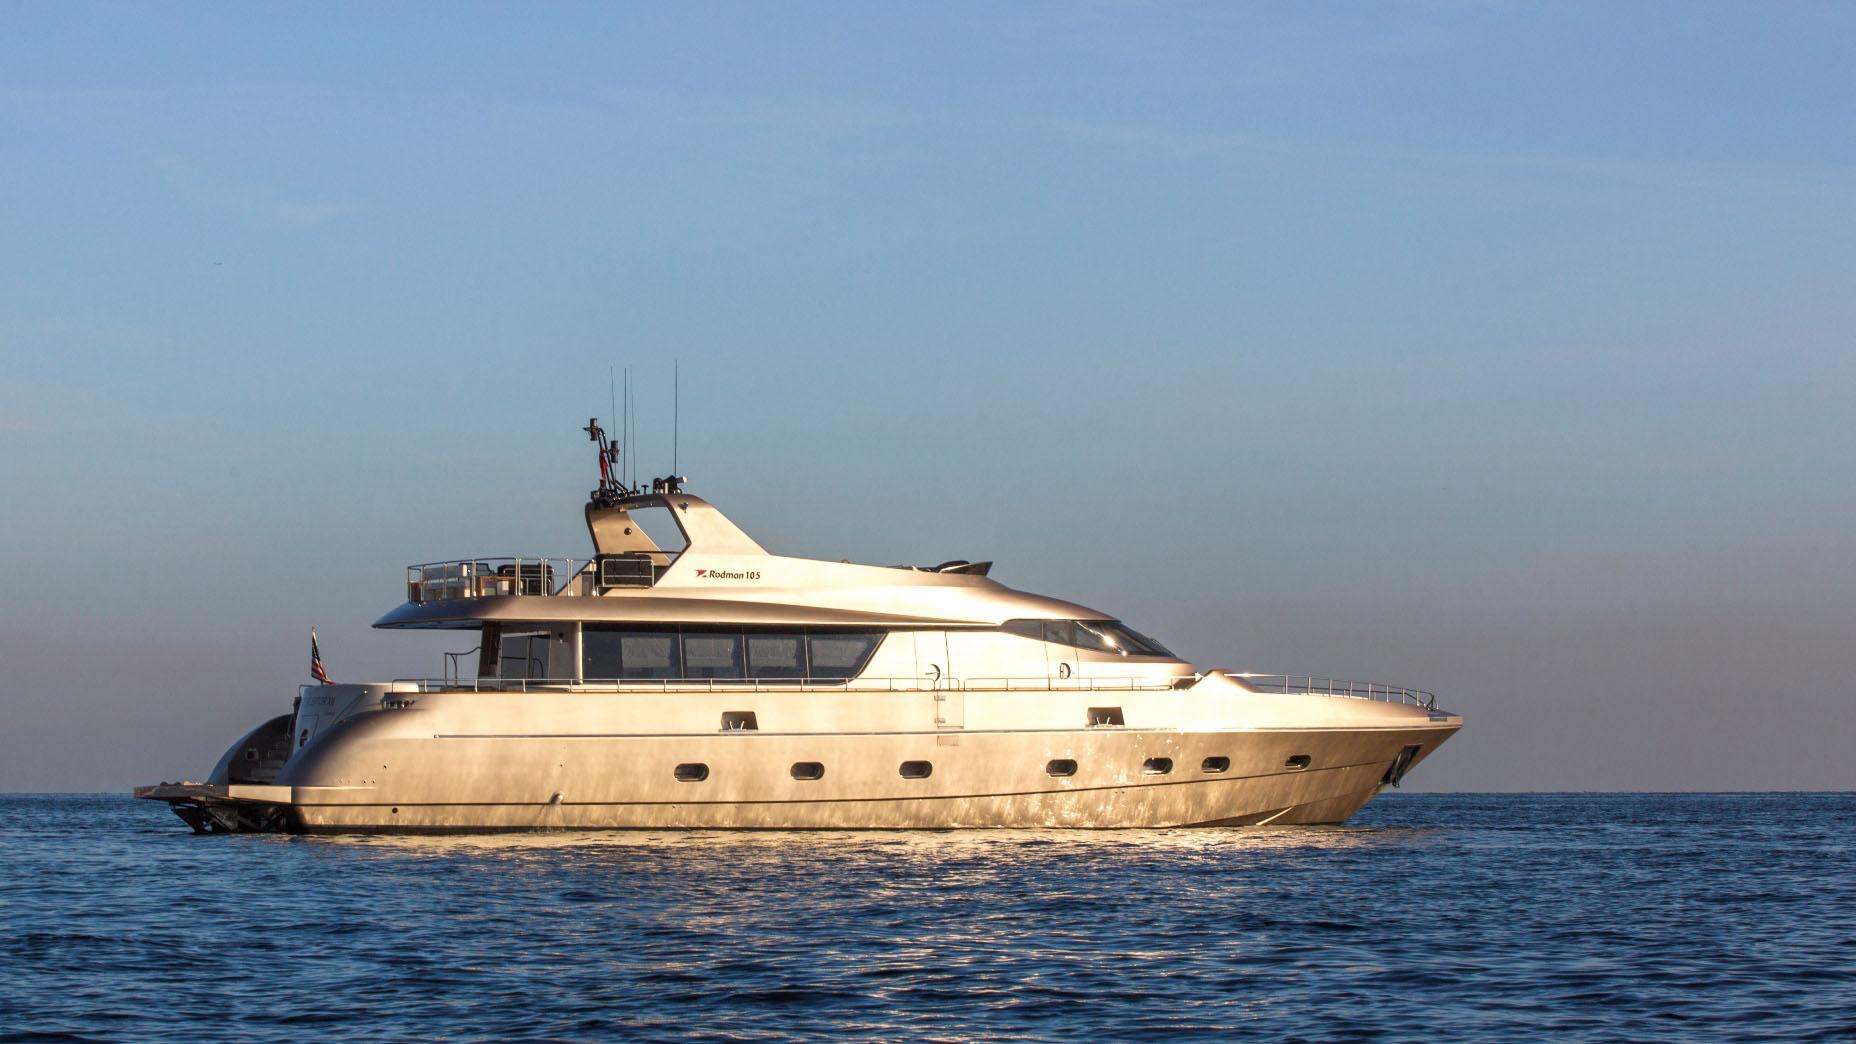 interceptor-xii-yacht-for-sale-profile